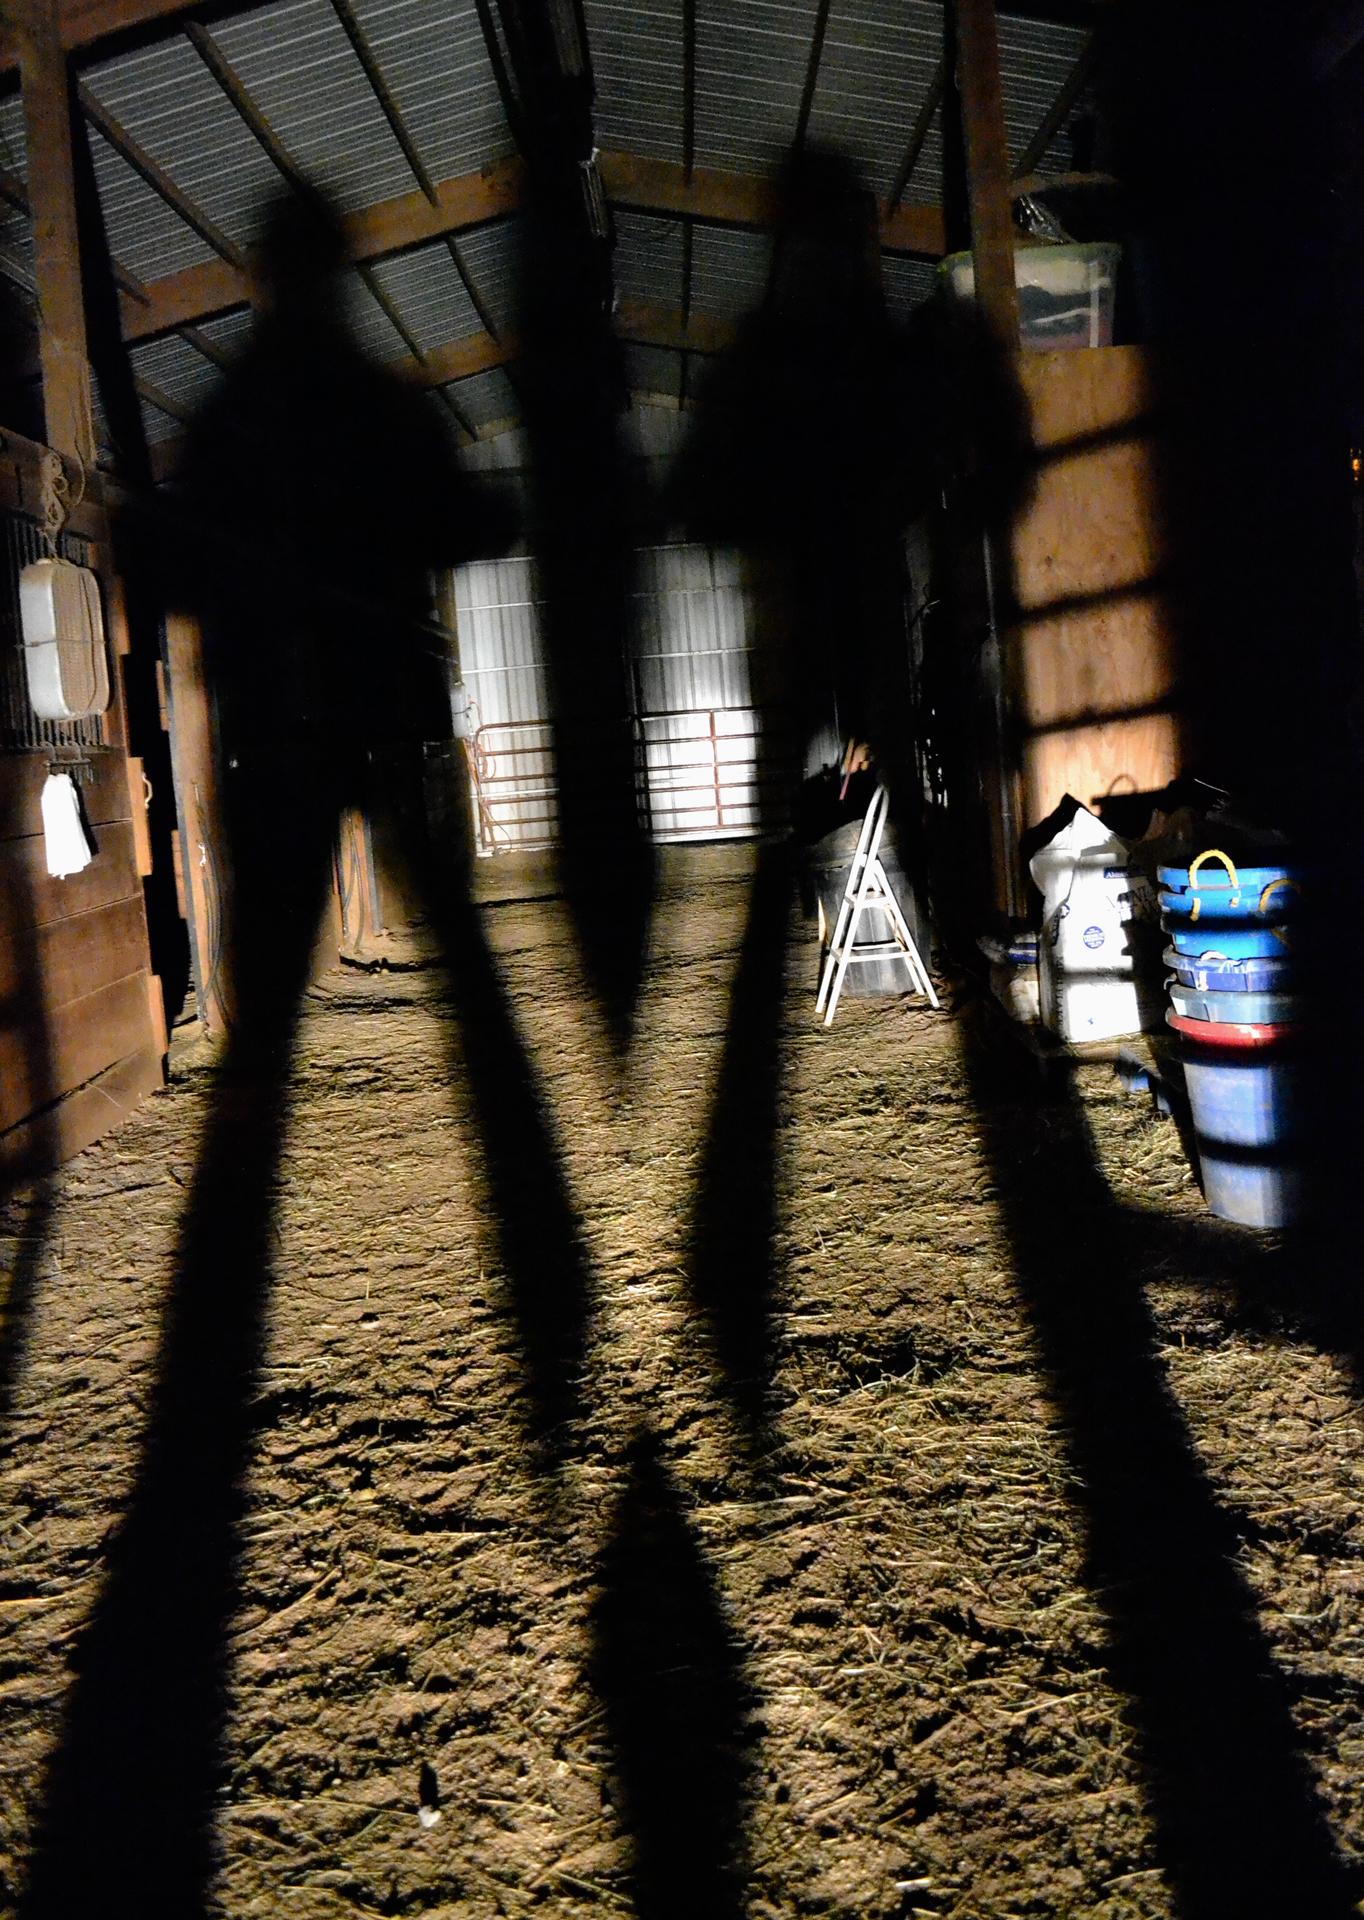 Shadowed Figures